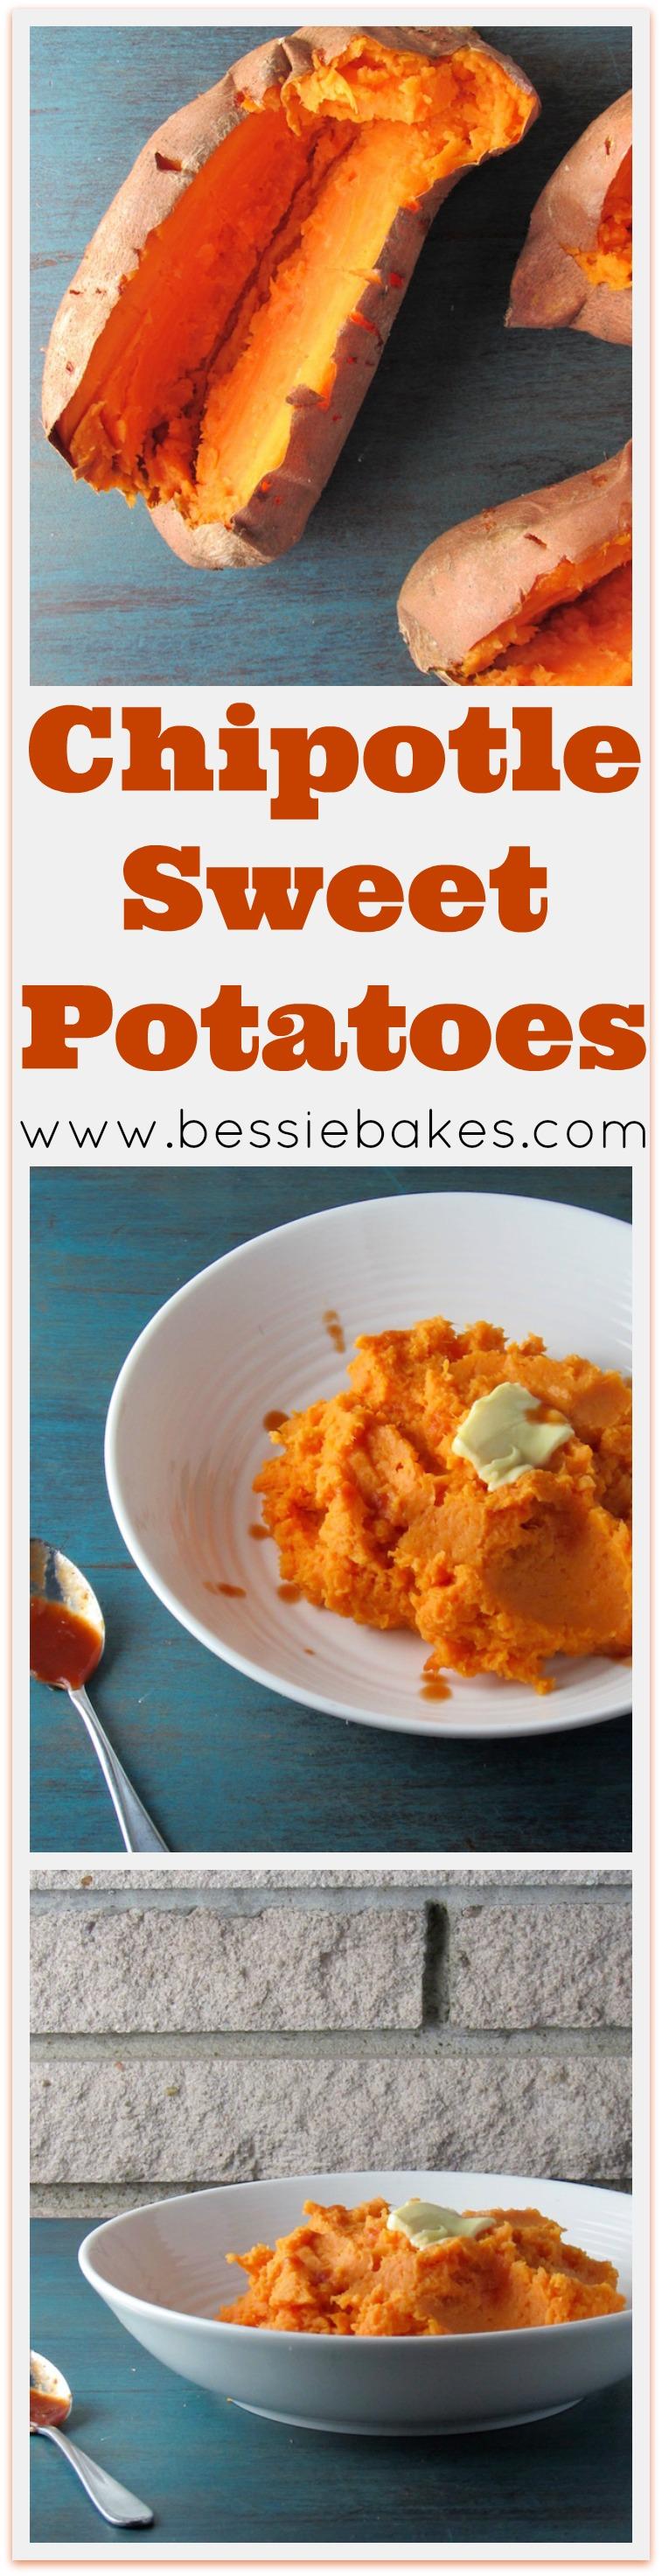 Chipotle Sweet Potatoes Pinterest